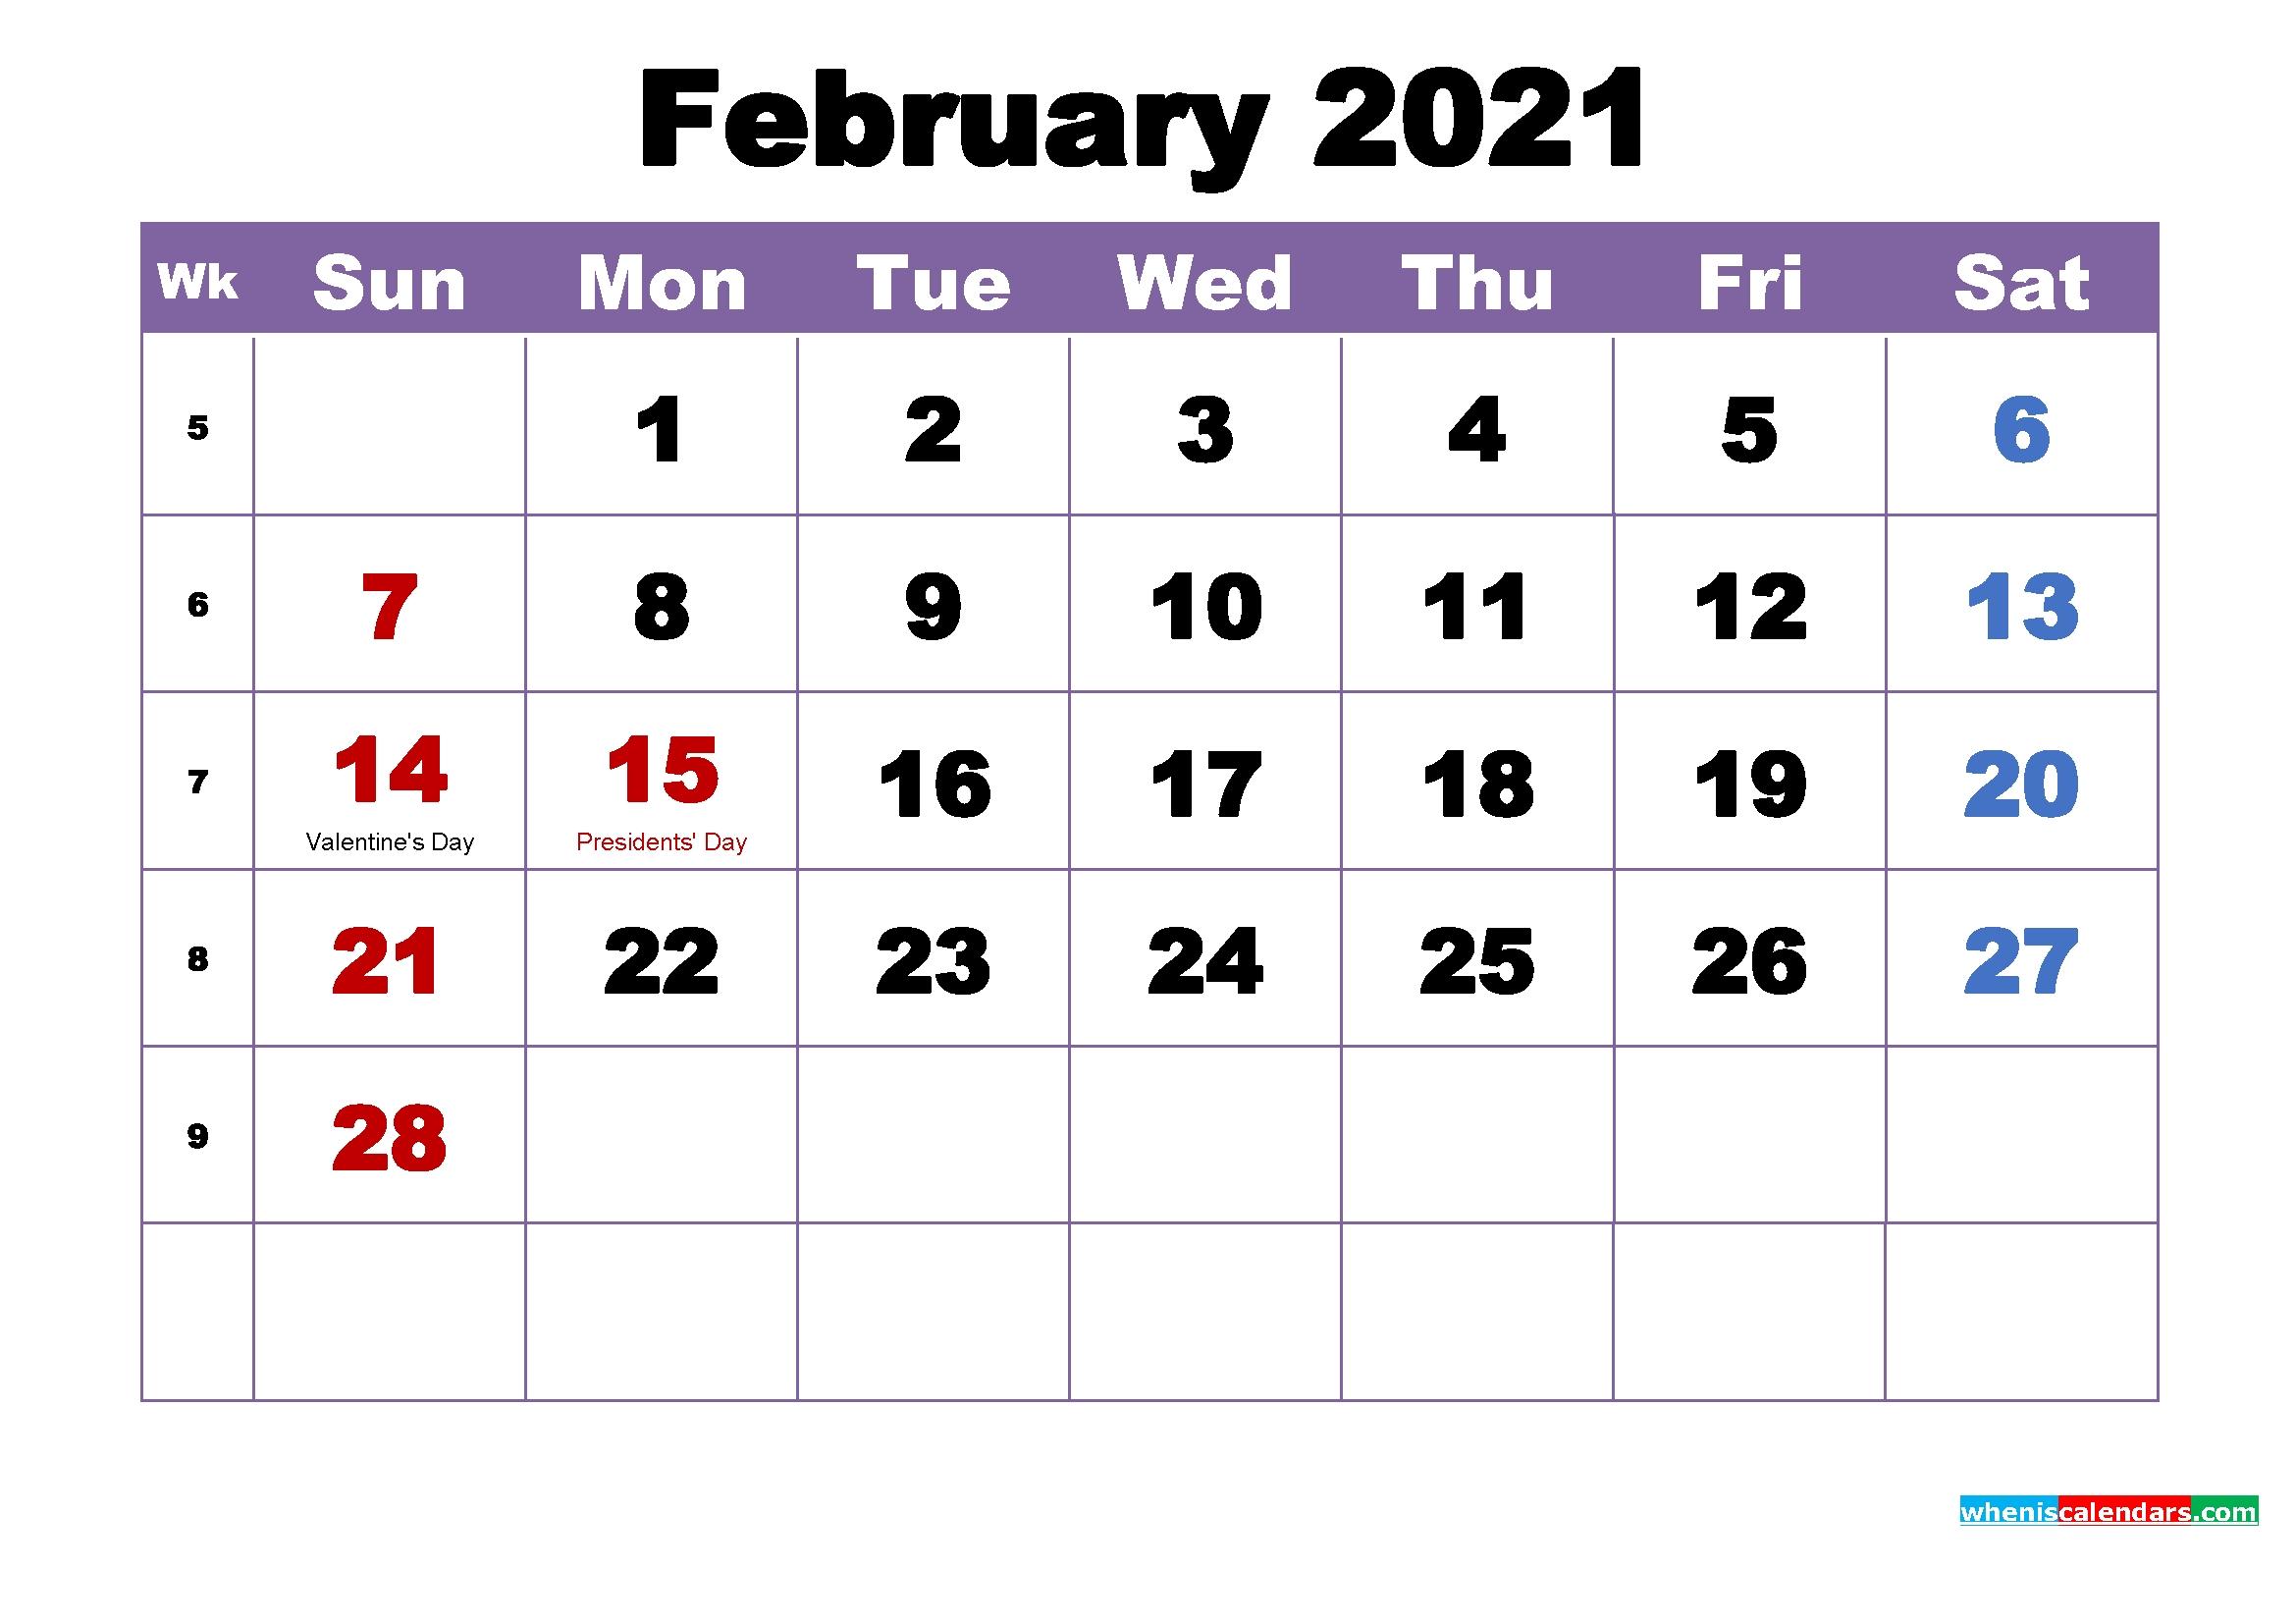 February 2021 Printable Calendar With Holidays Word, Pdf - Free Printable 2020 Monthly Calendar